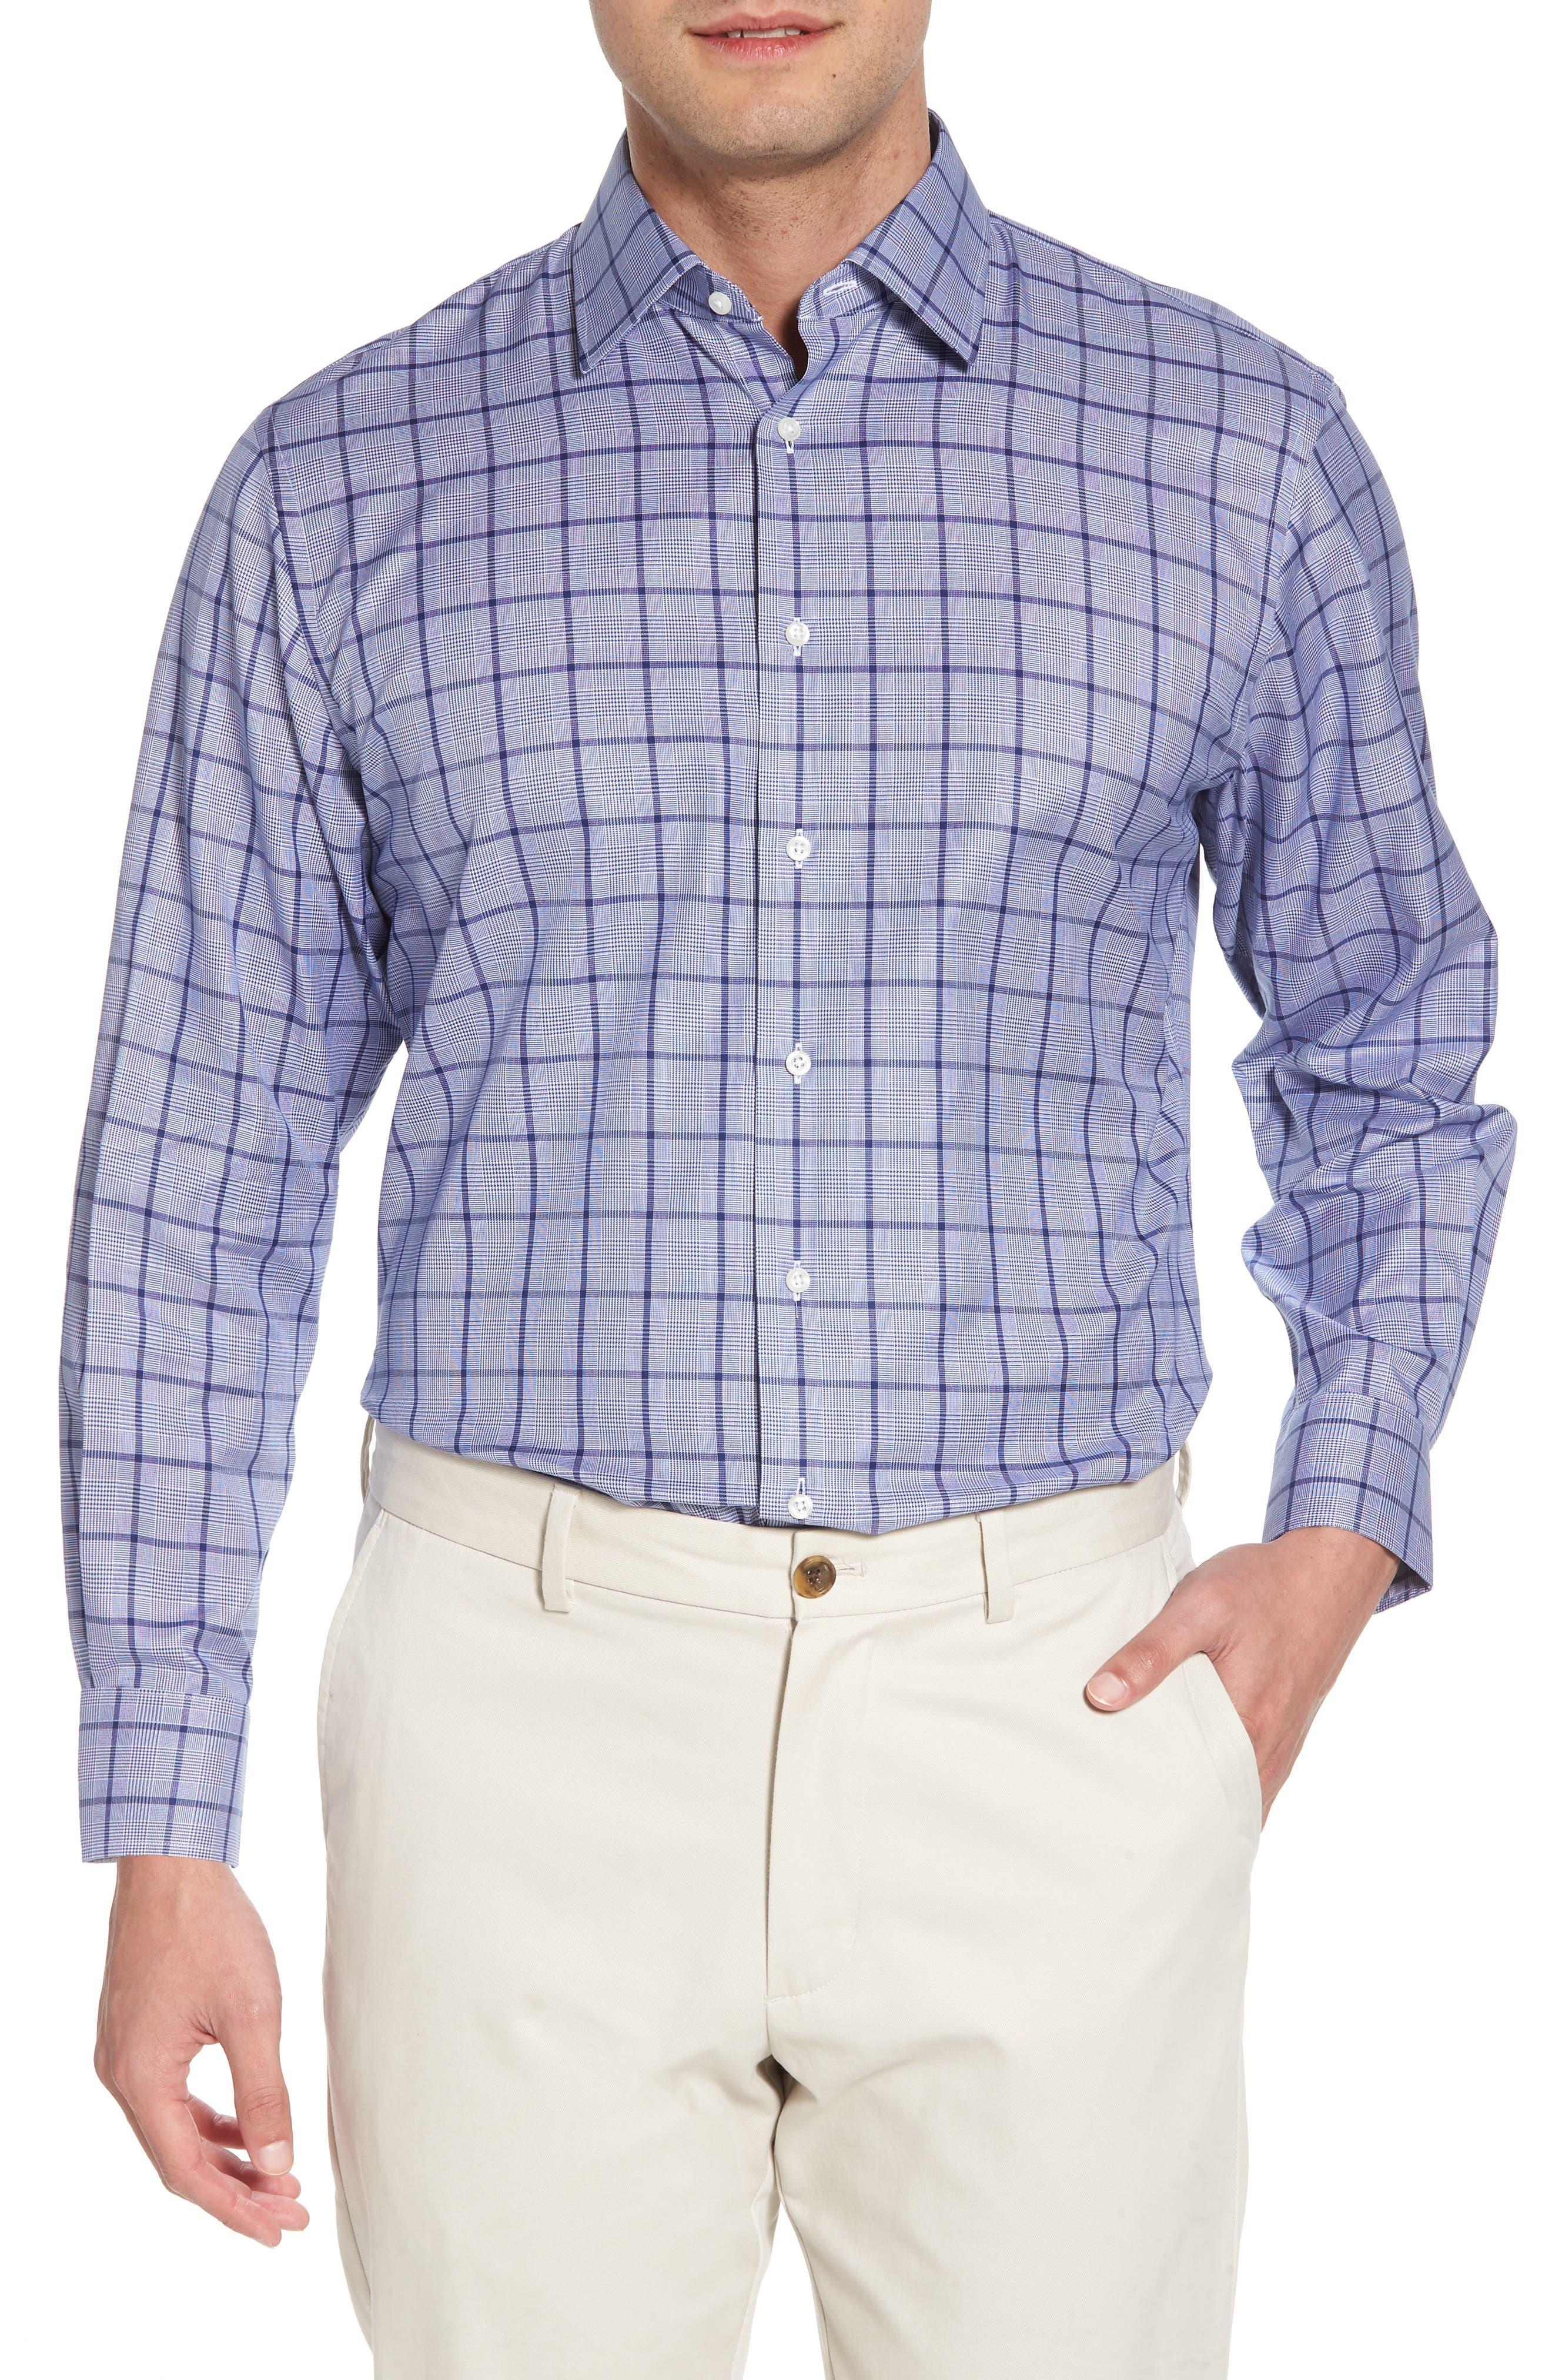 Main Image - Nordstrom Men's Shop Traditional Fit Check Dress Shirt